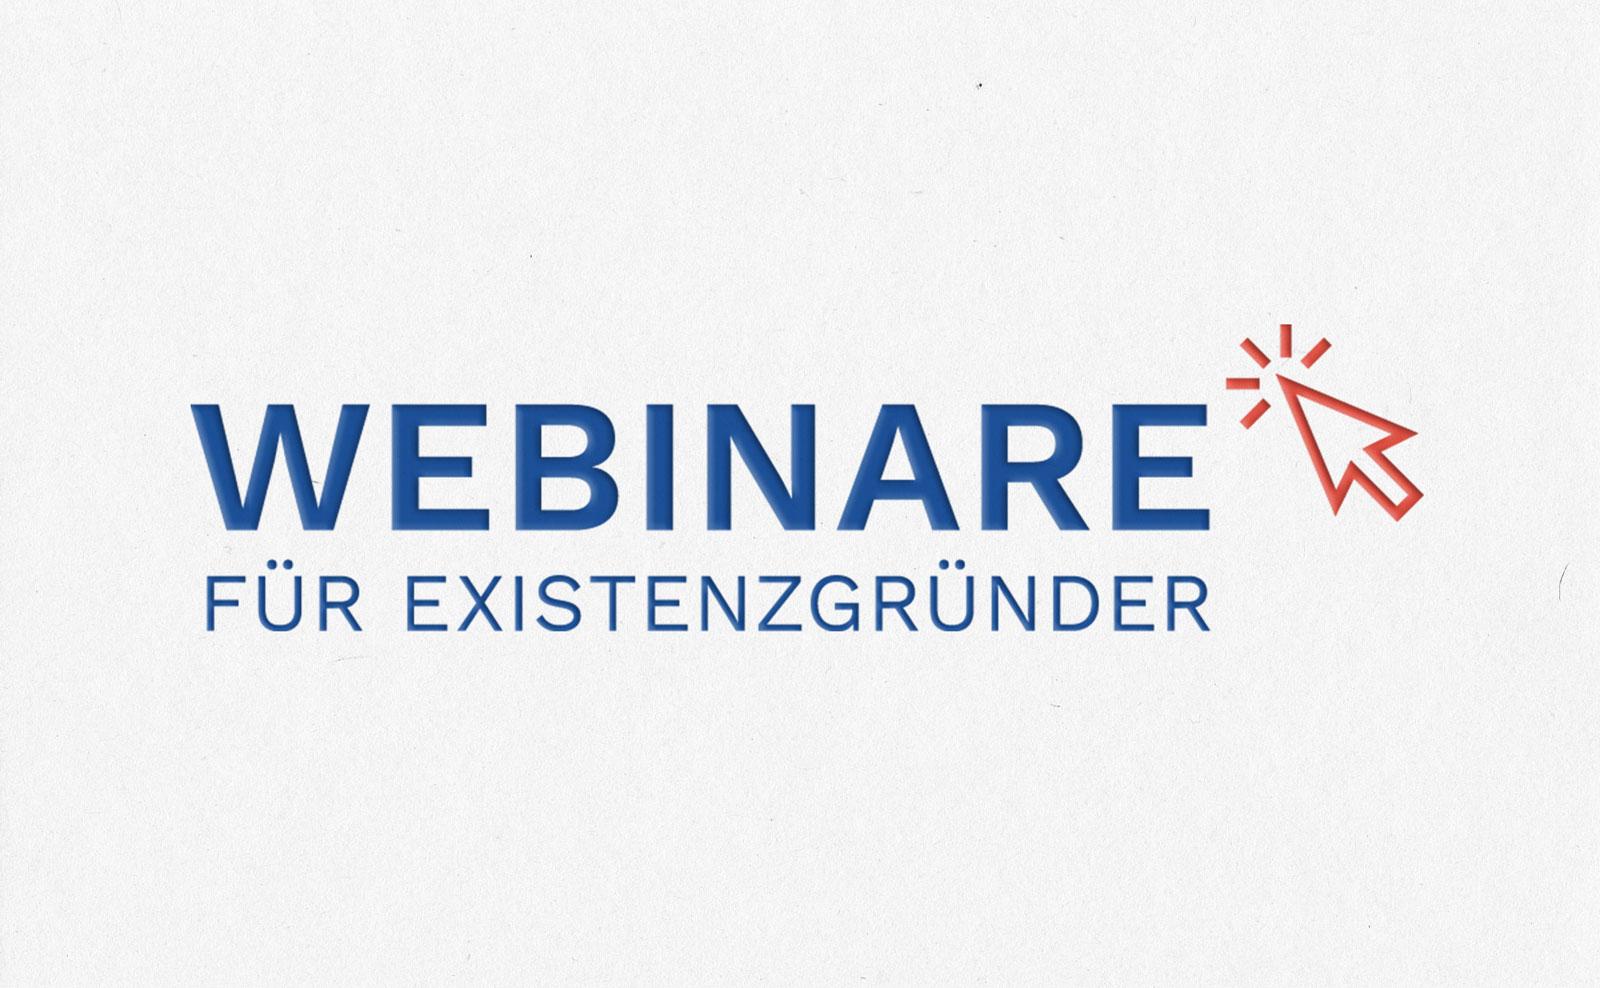 Designbüro Mittelsdorf Webinare → Corporate Design, Piktogramme, Webdesign